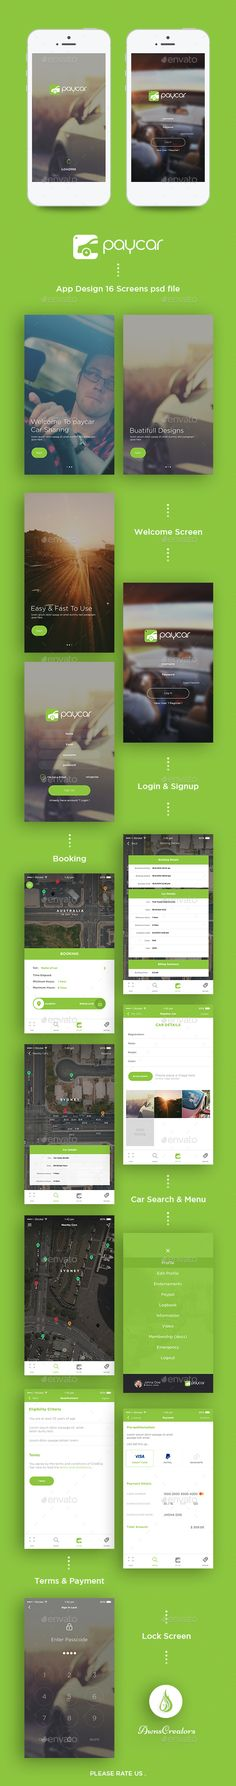 Paycar App UI Kit PSD. Download here: https://graphicriver.net/item/paycar-app-ui-kit/16279829?ref=ksioks